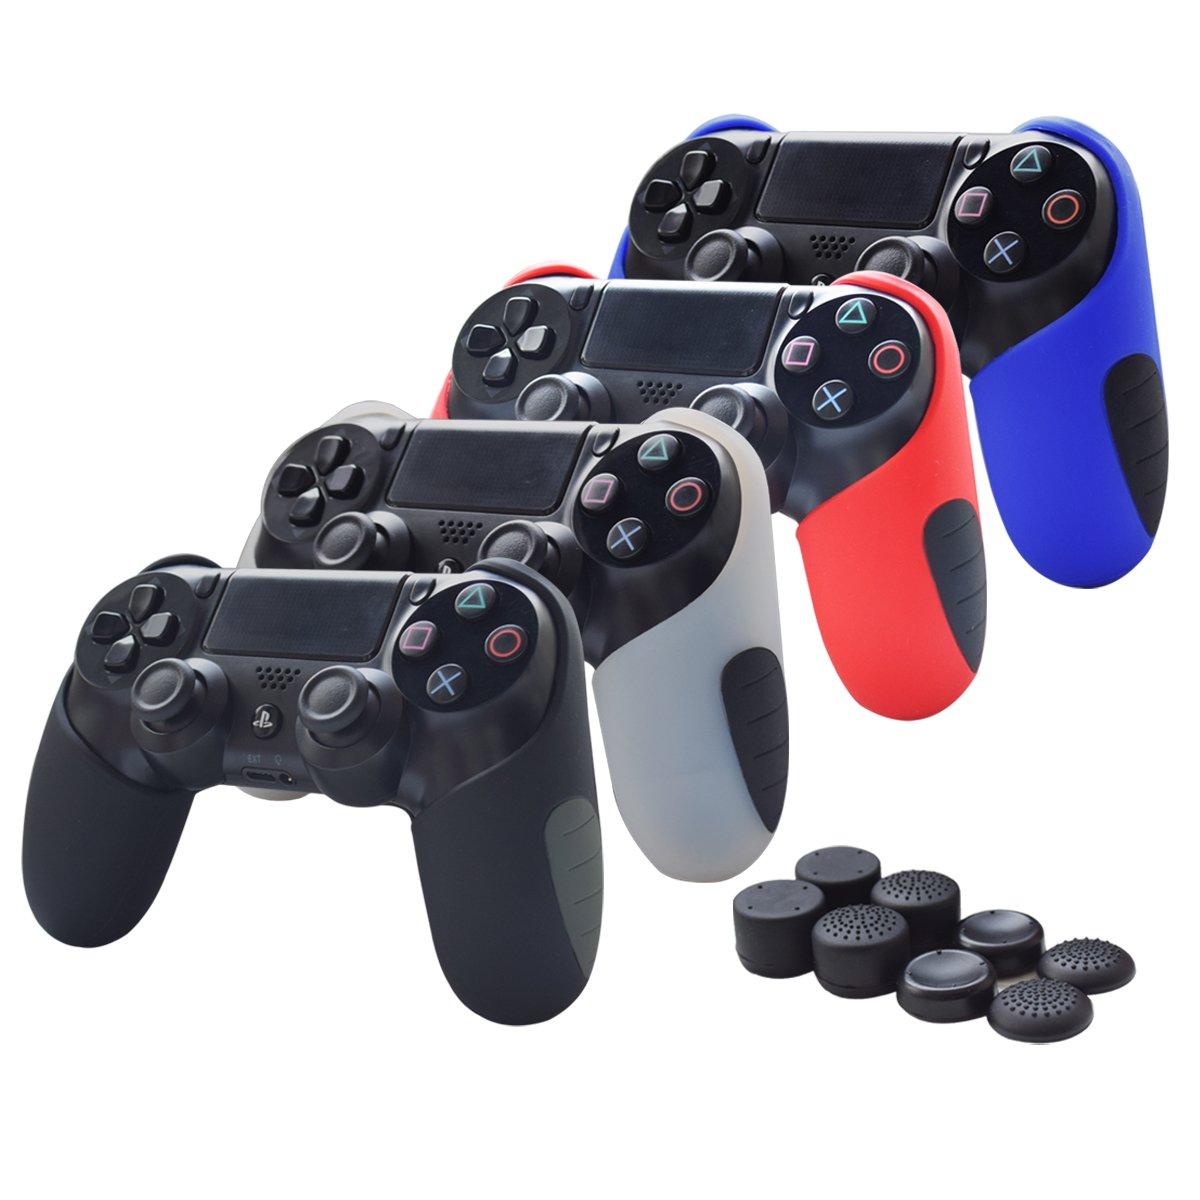 4 Fundas De Silicona Para Control Dualshock Ps4 (xmp)